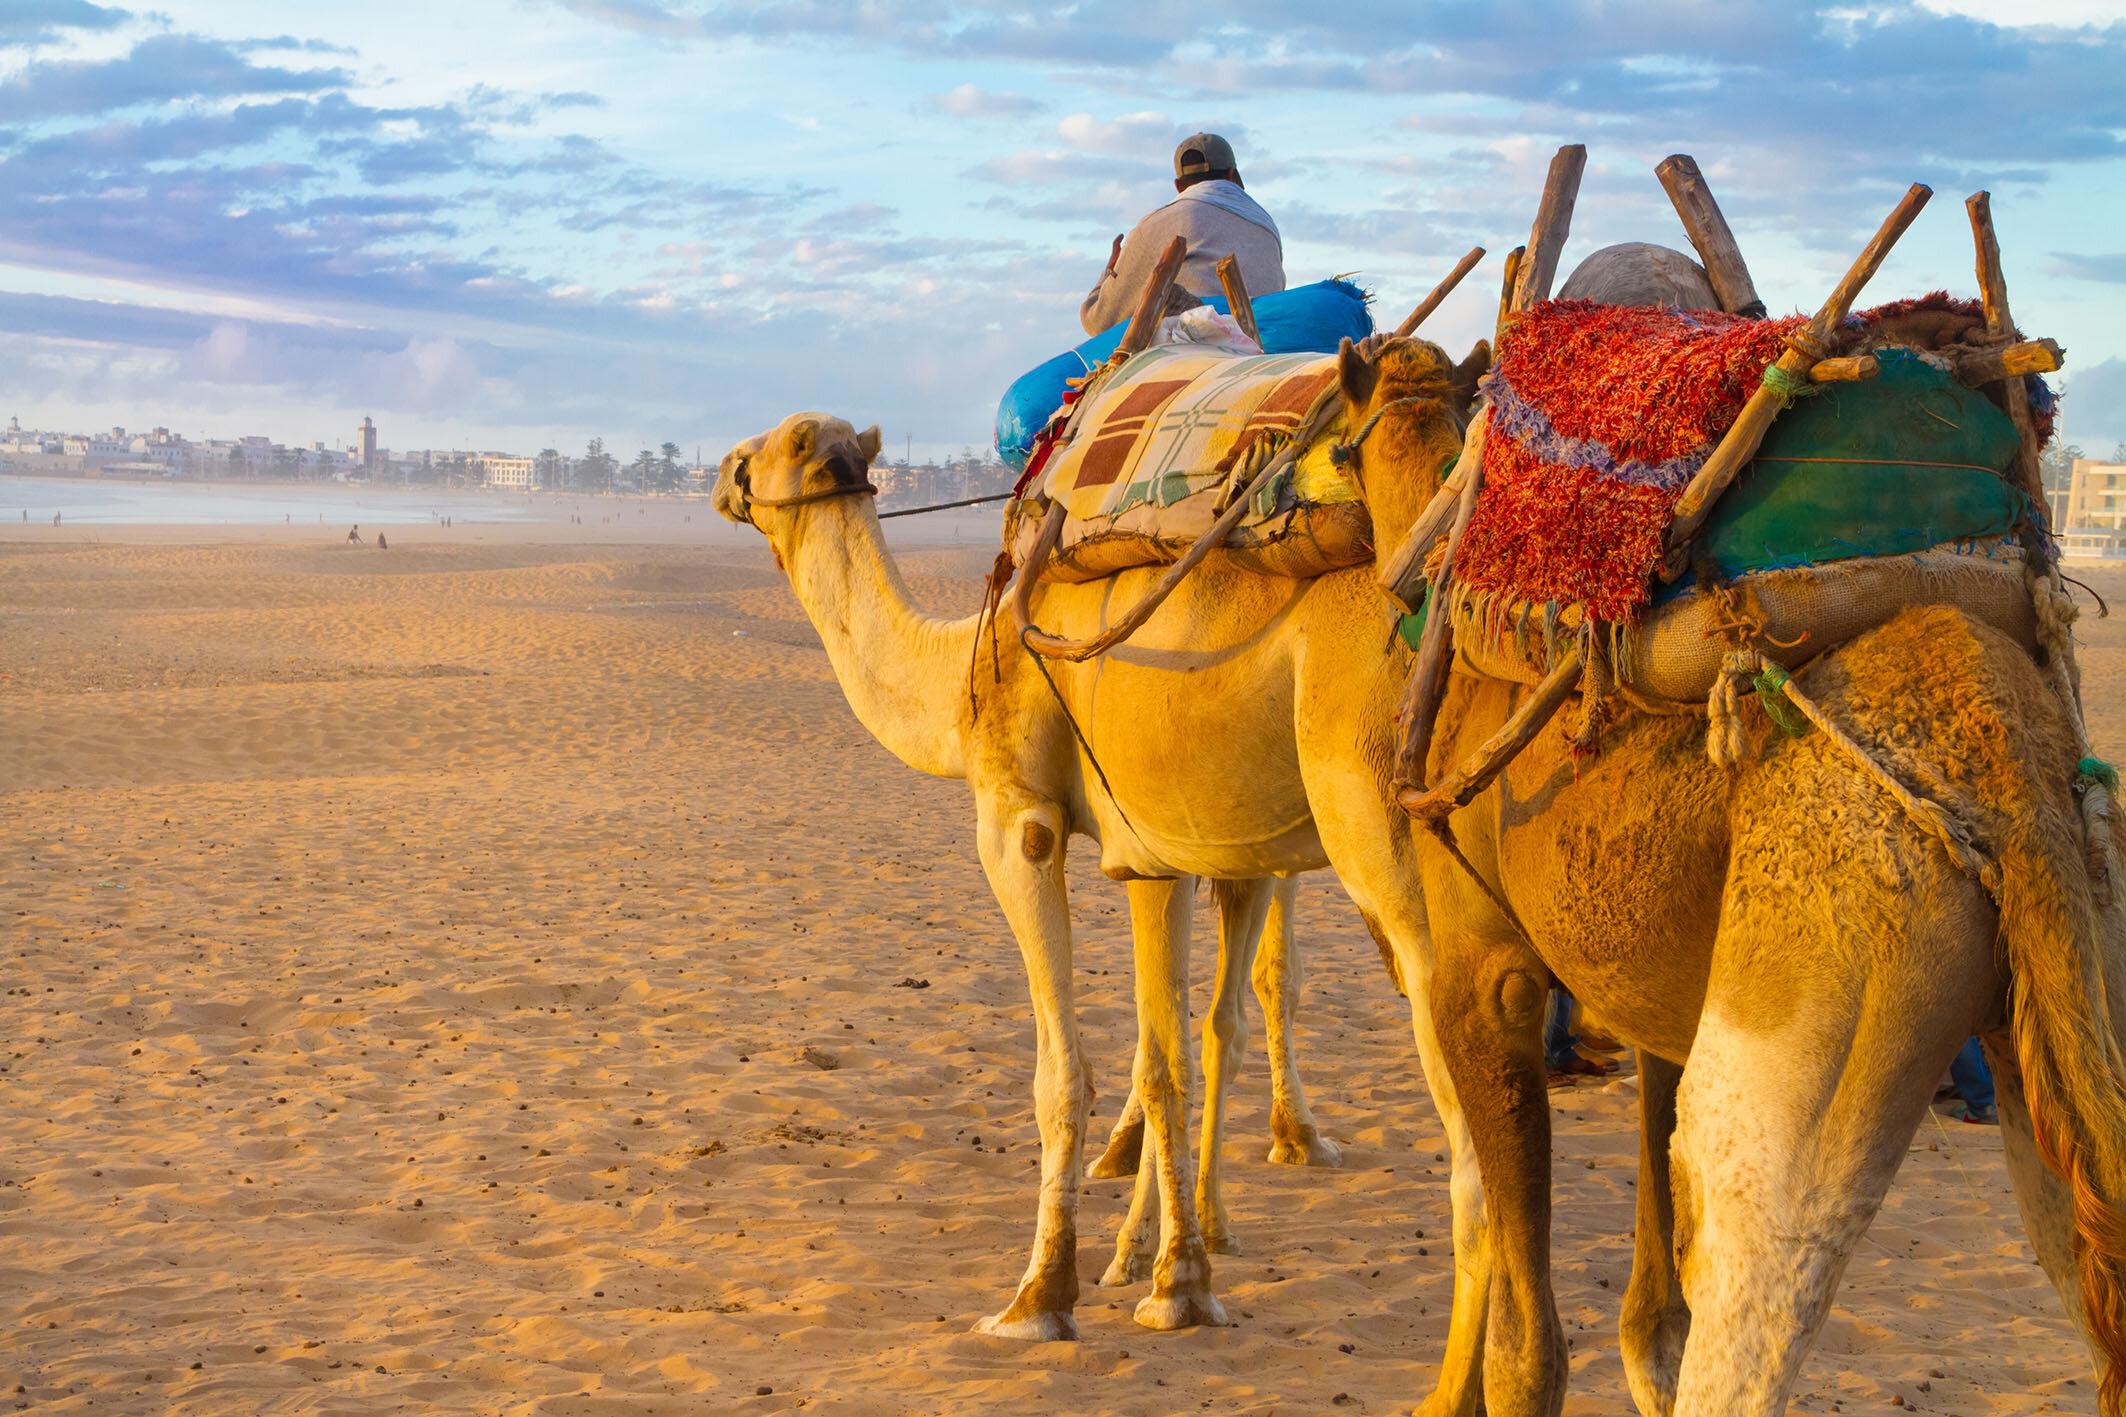 Kamel_Karawane_Marokko_Fotolia_96748996_XL.jpg